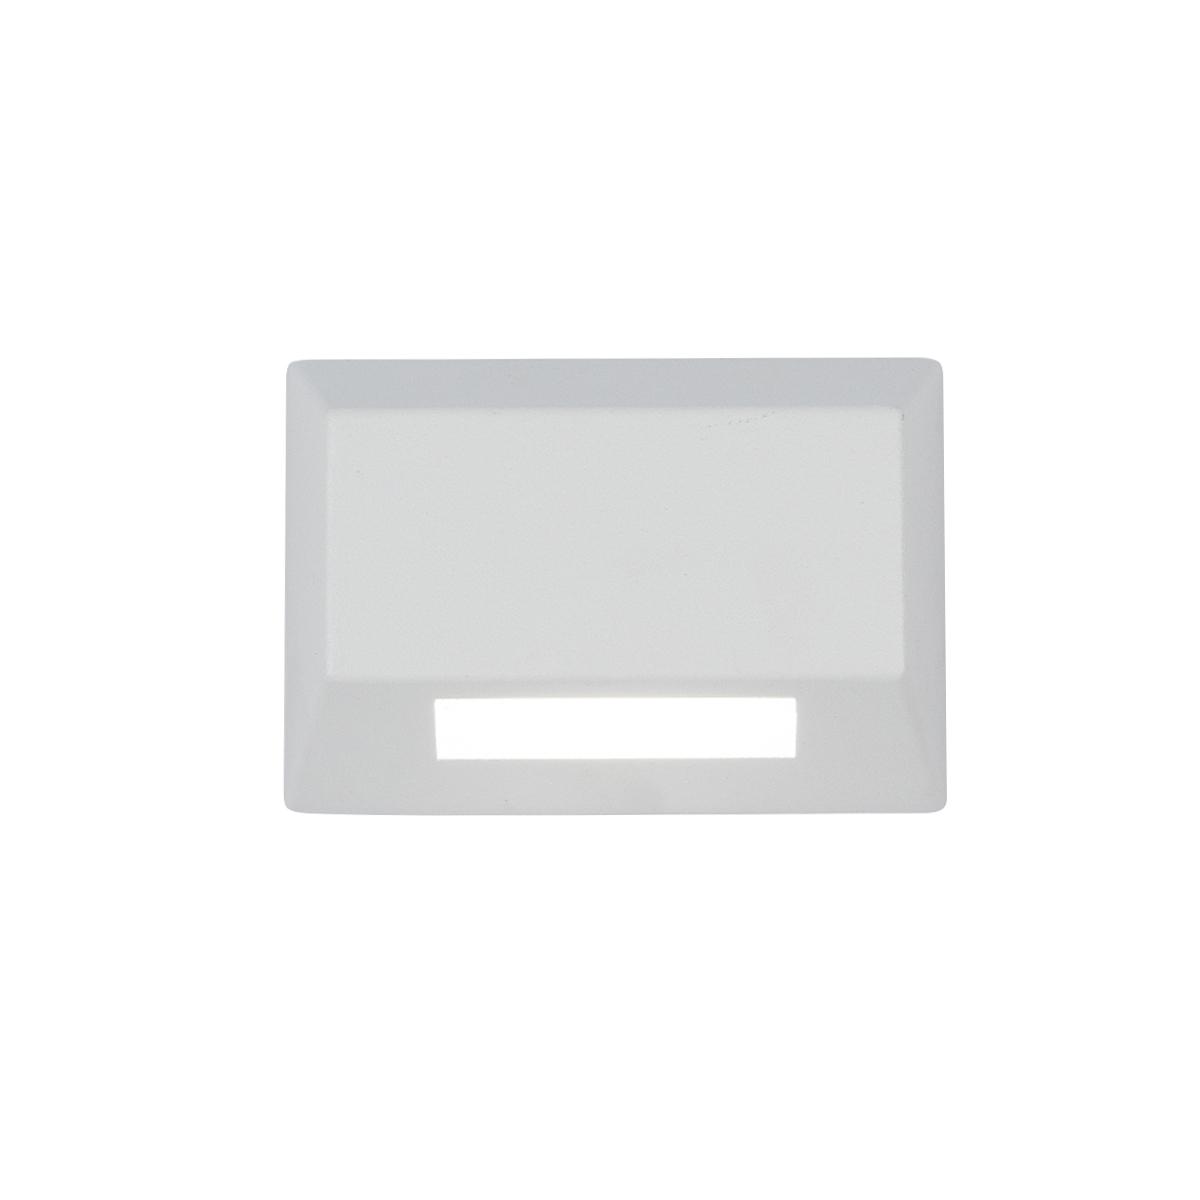 https://waclighting-images.s3.amazonaws.com/TOP_PROD_IMAGE/3031-27BBR_IMRO_2.jpg